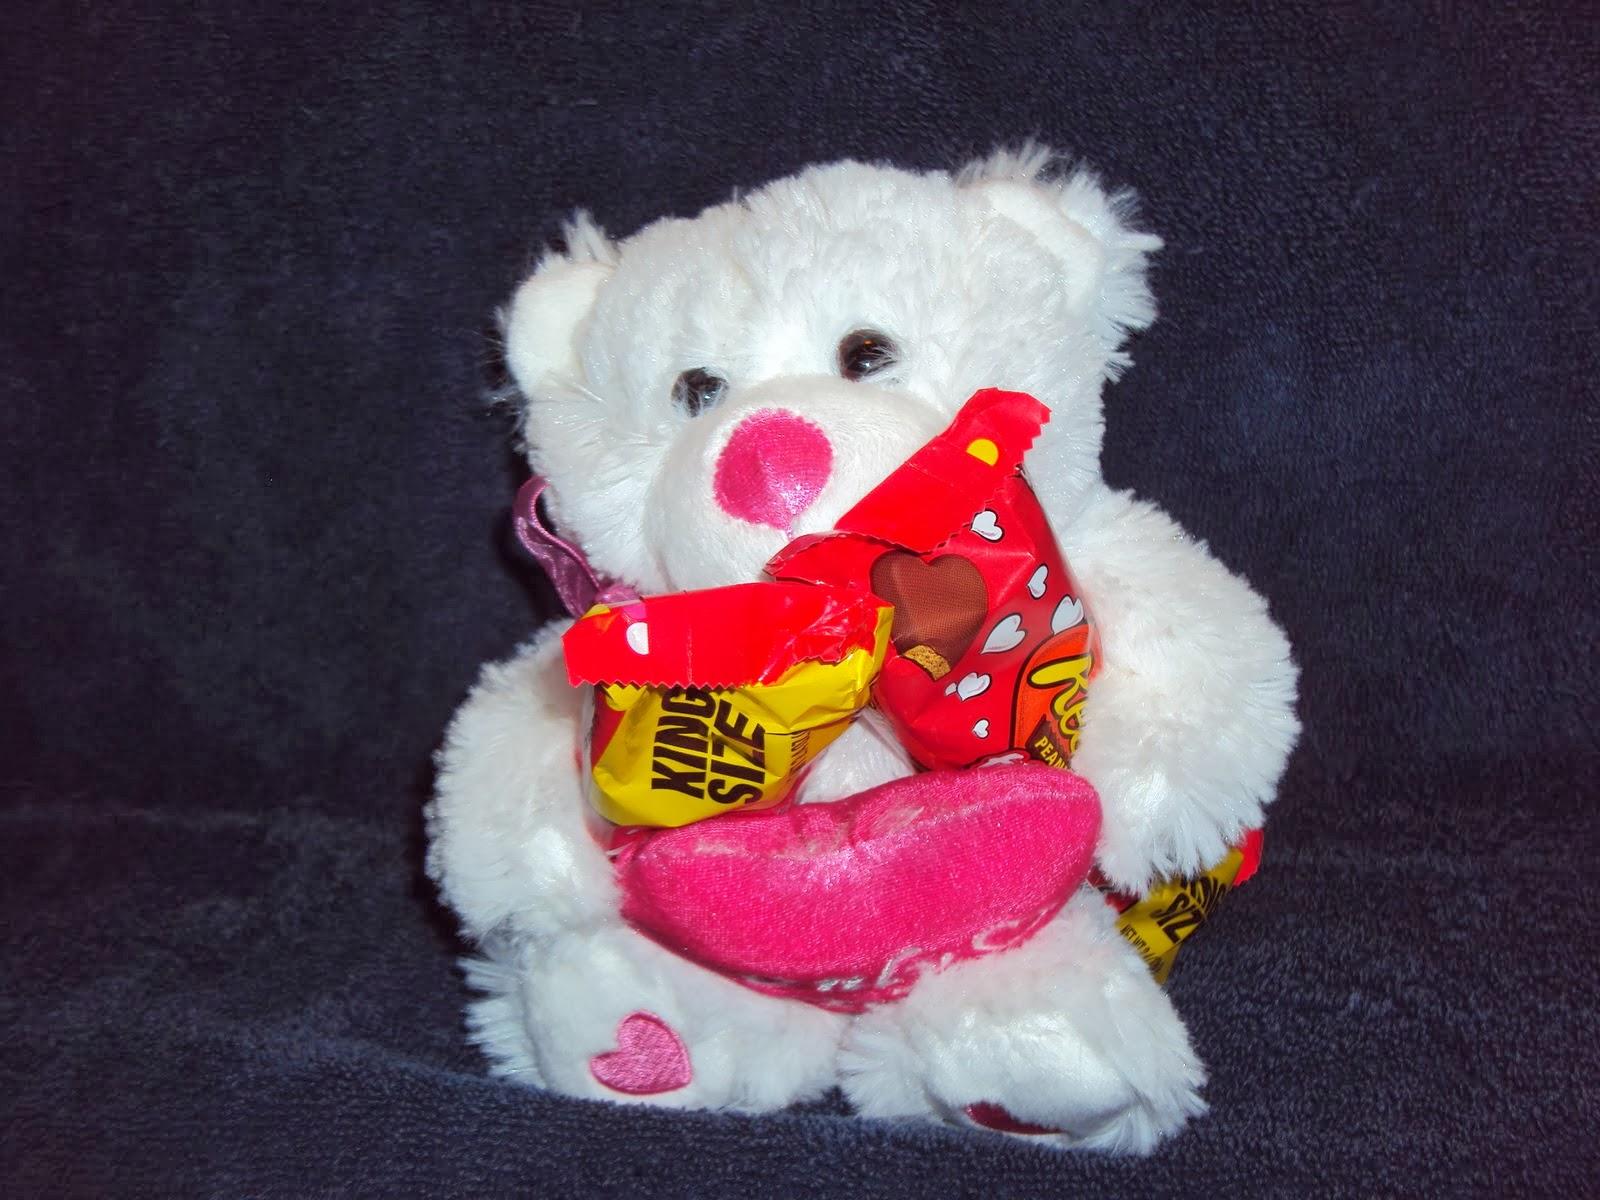 Cute teddy bears with hearts   Nice Pics Gallery